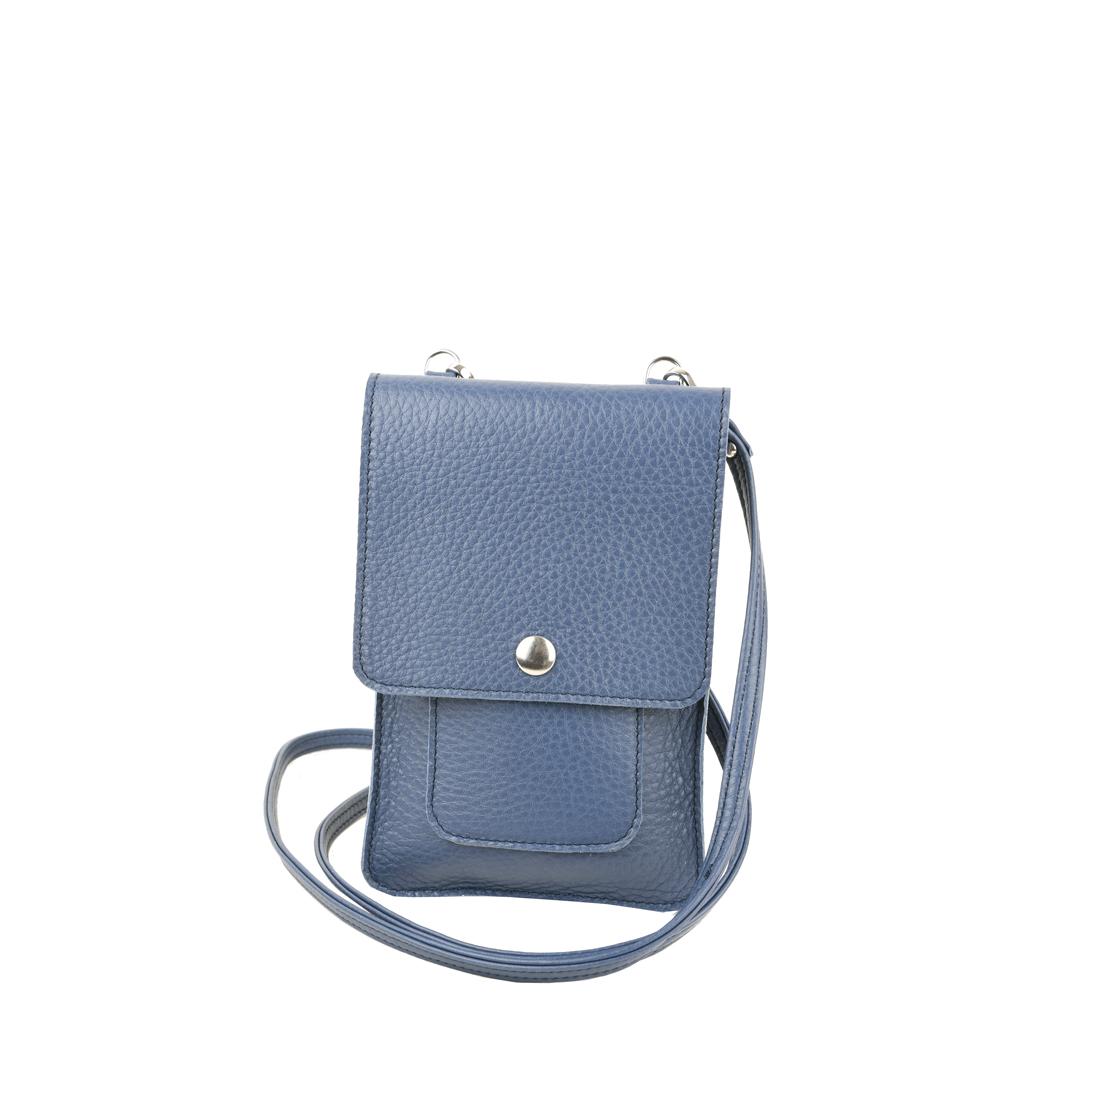 Zoe chalk blue phone pouche